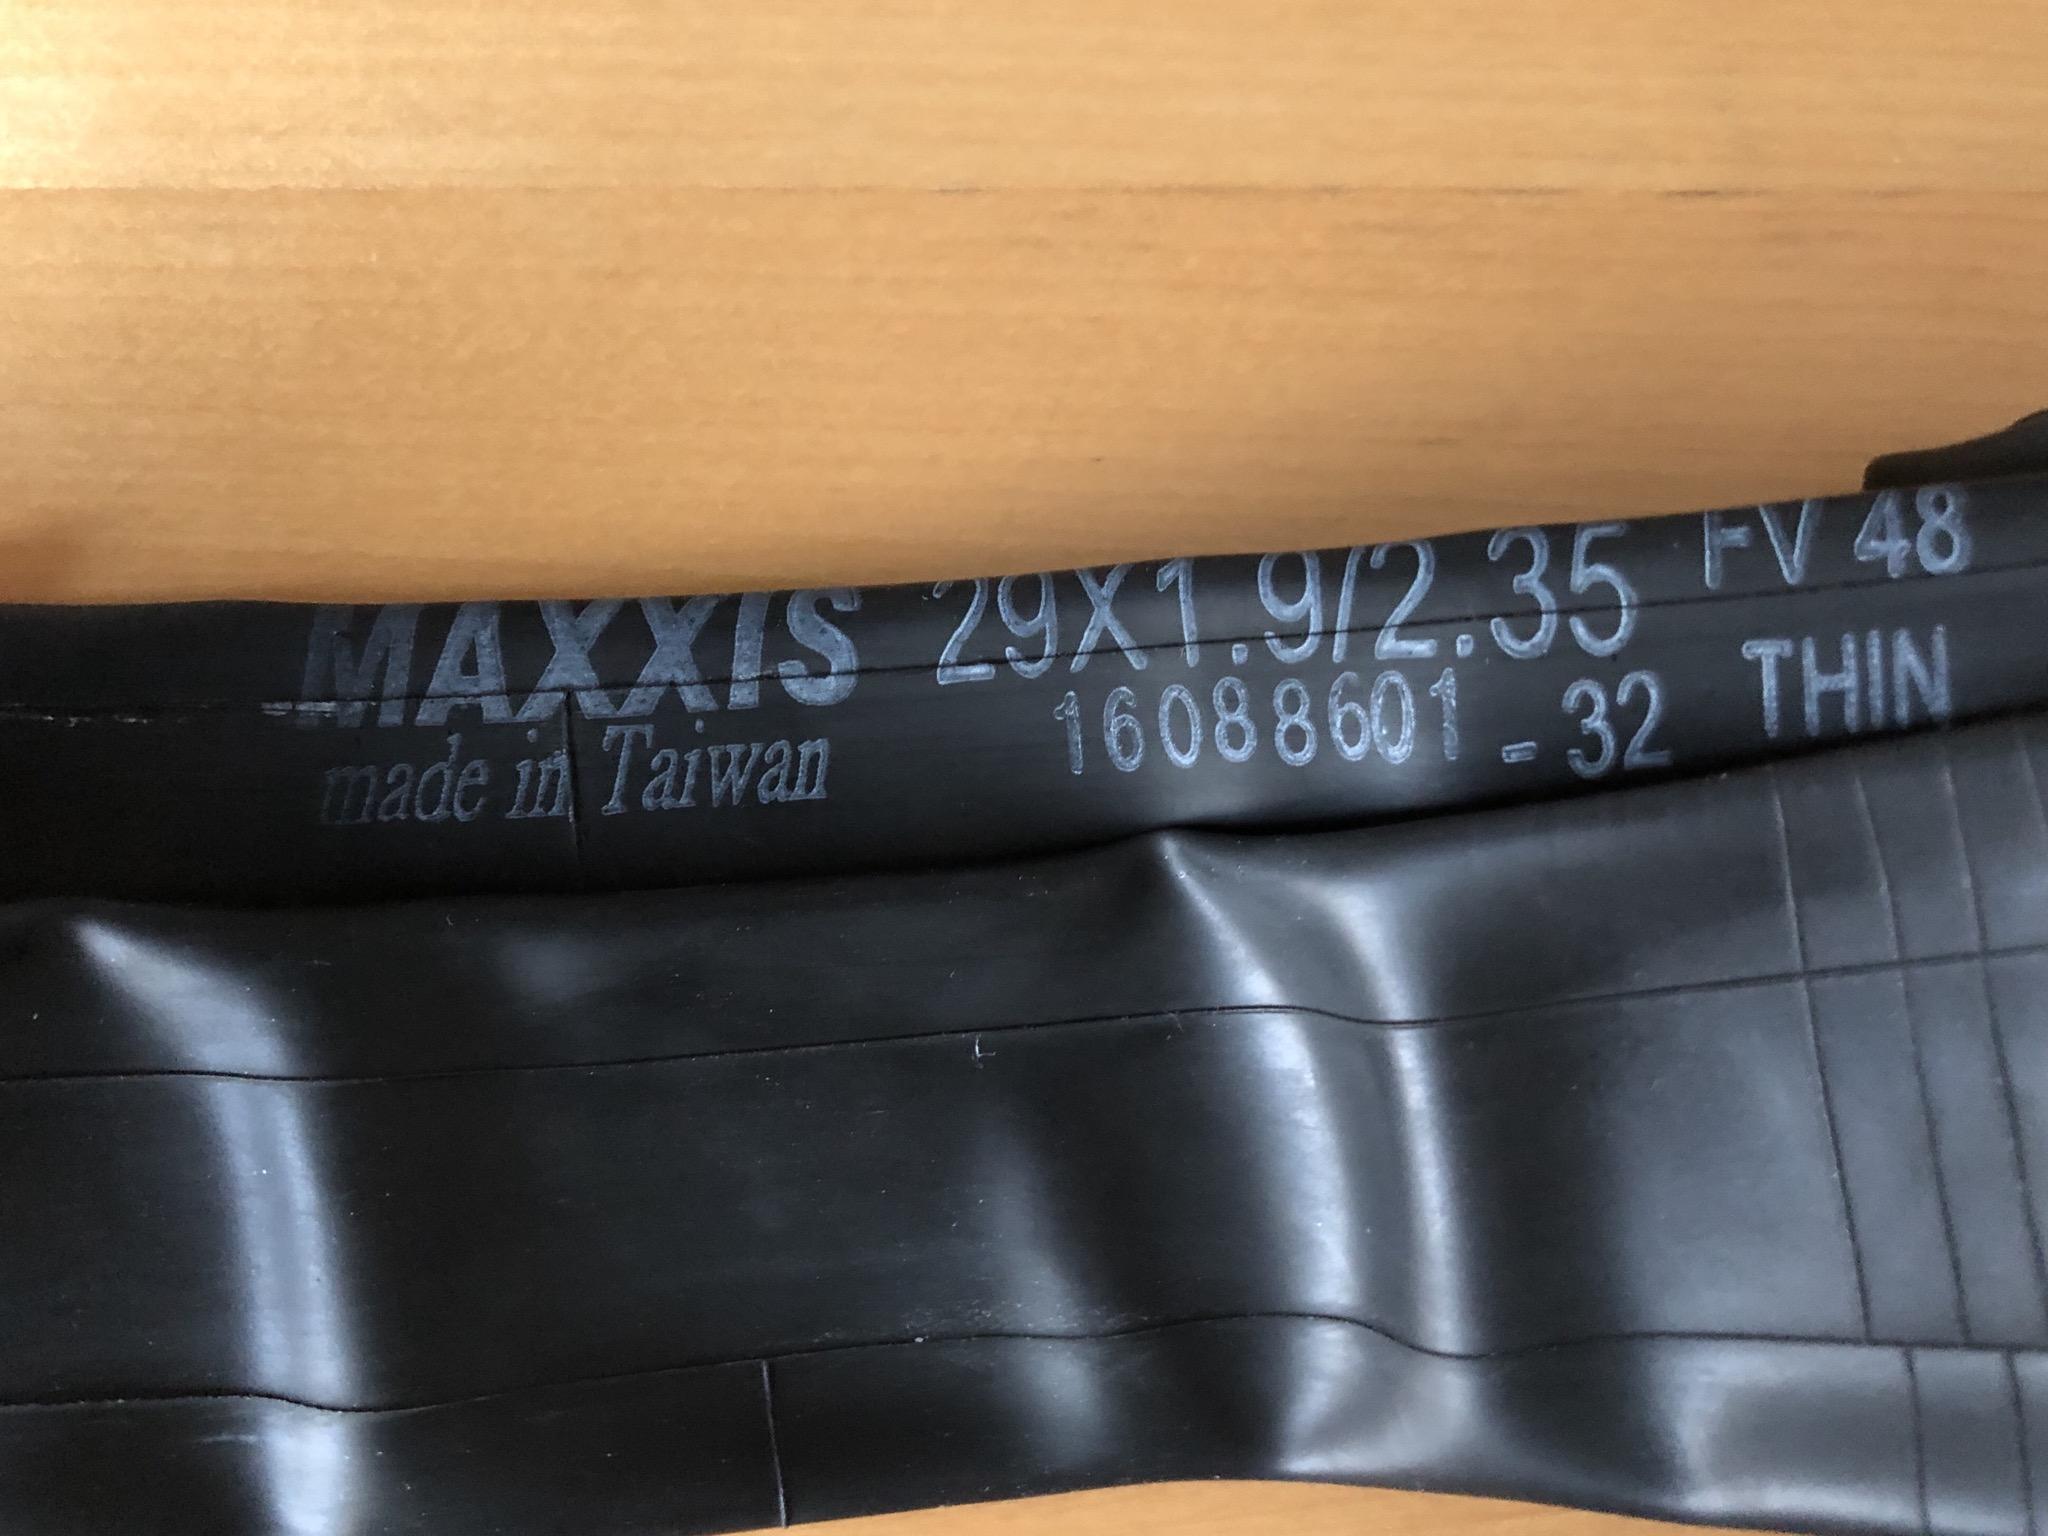 70DB5738-2FBD-4185-8EF3-E54A022FE8B2.jpeg